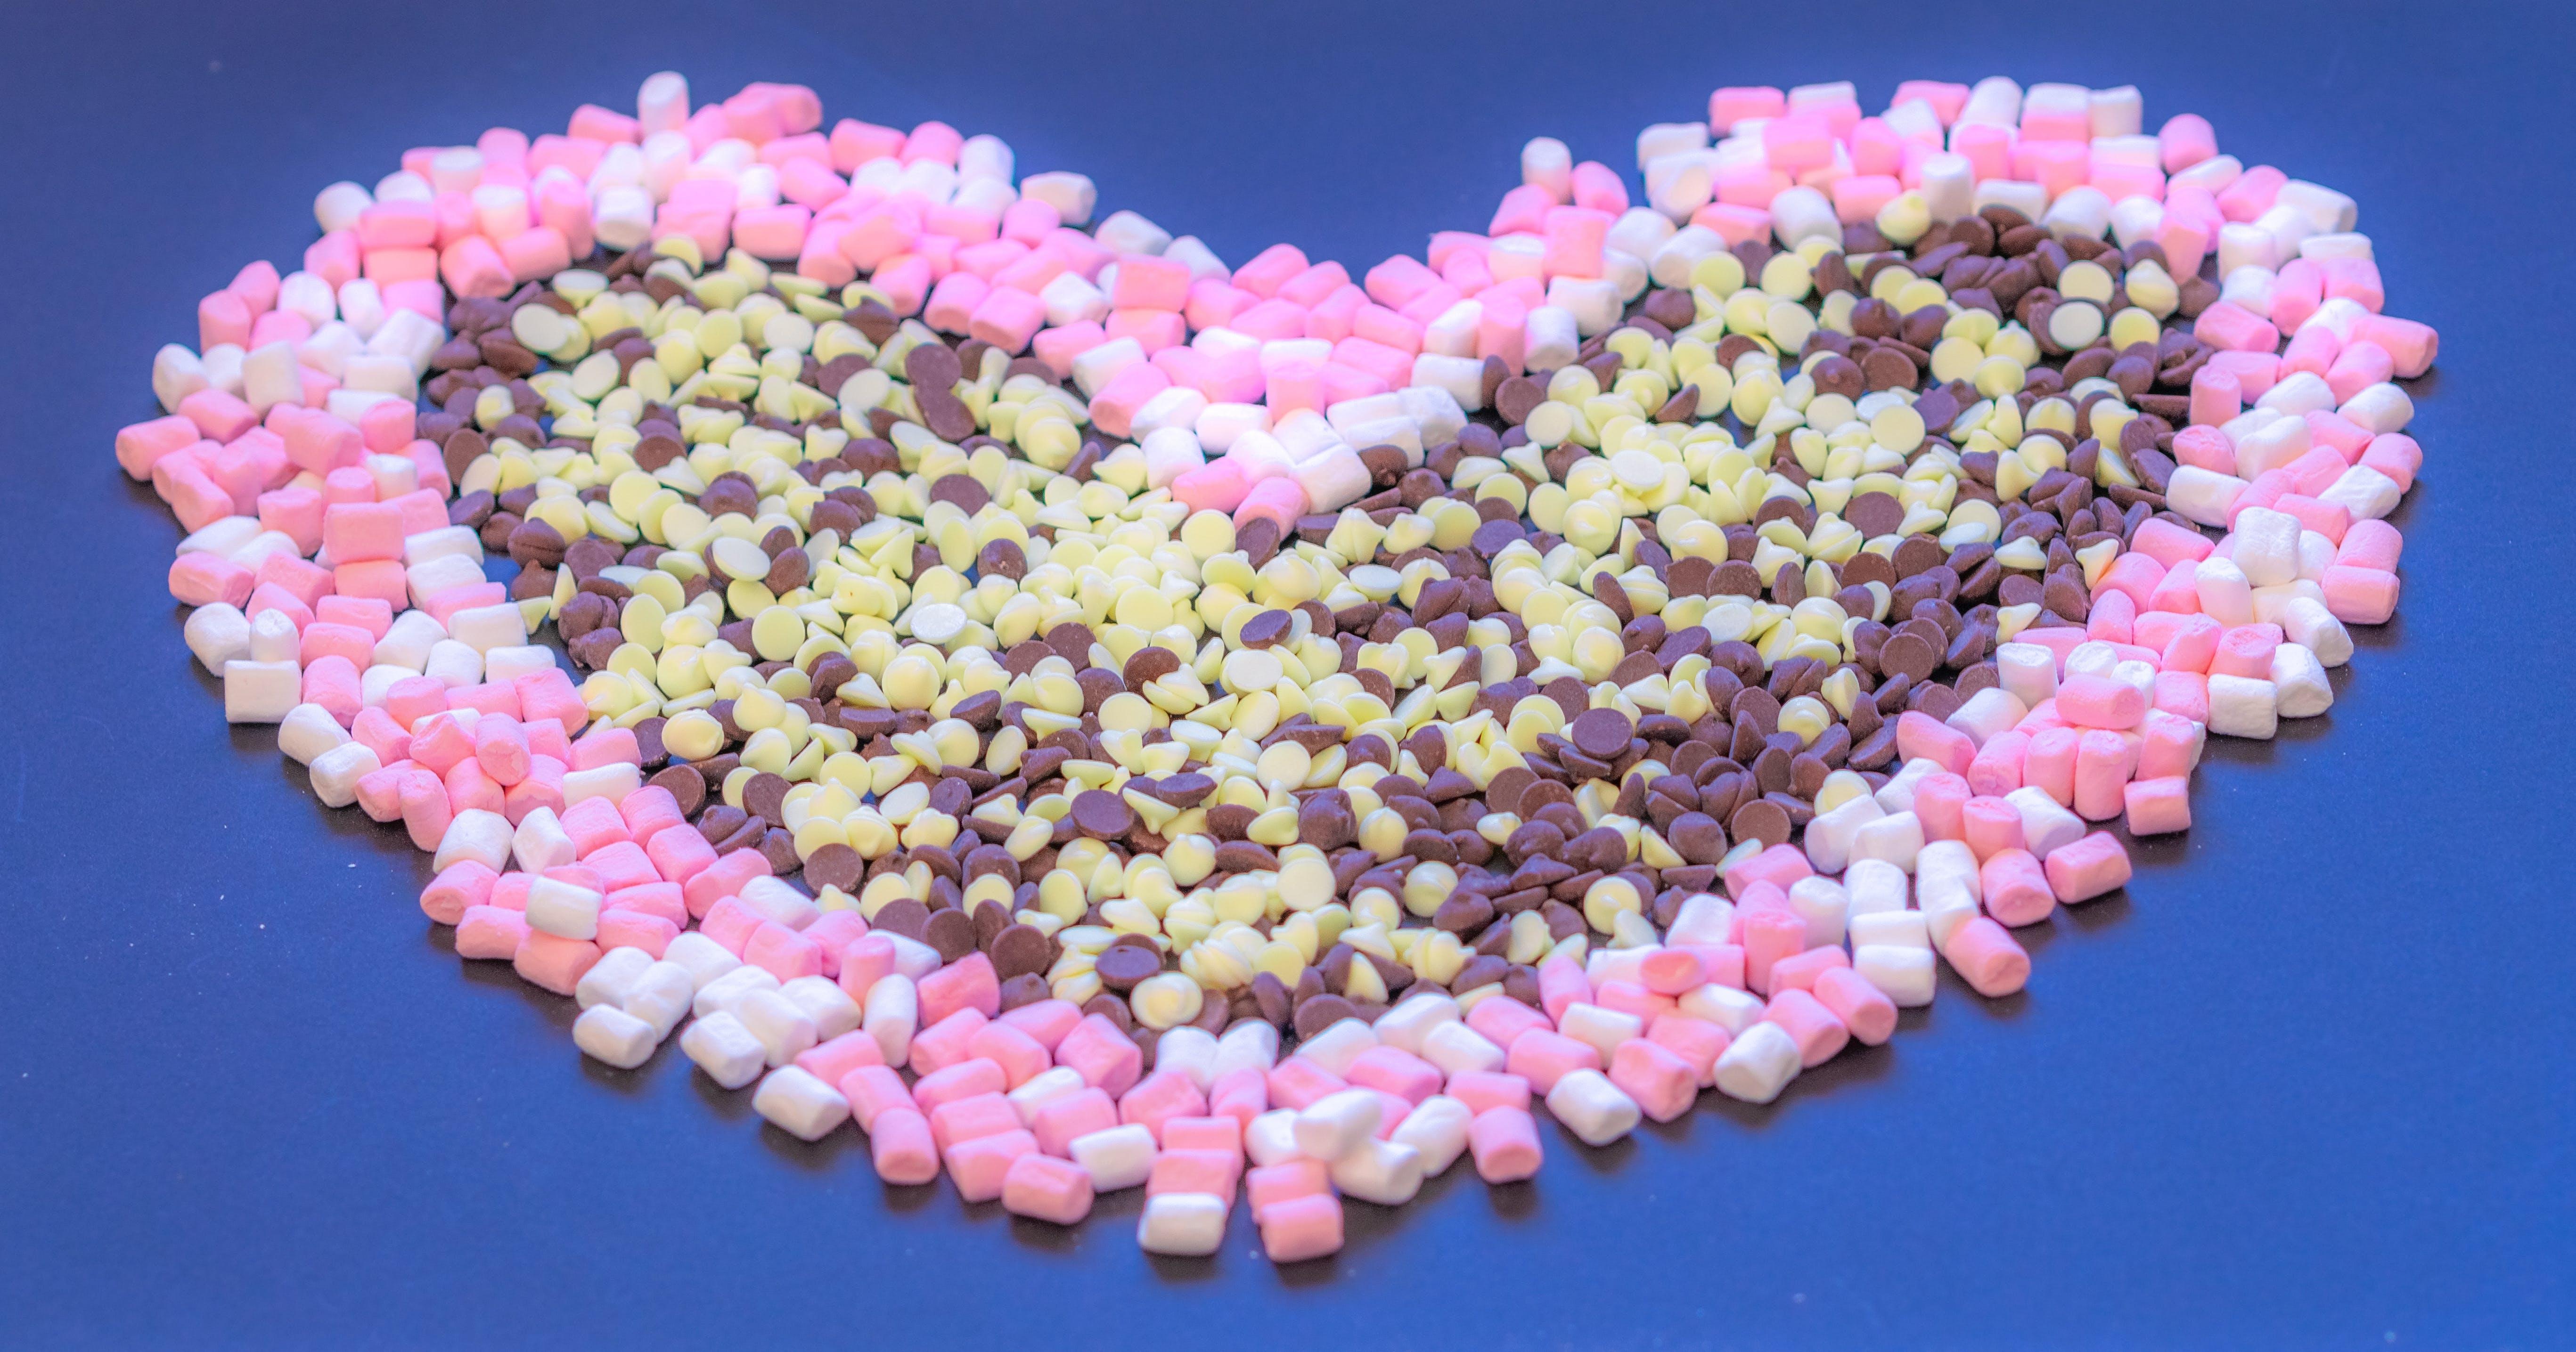 Free stock photo of black background, candies, chocolate, decorative